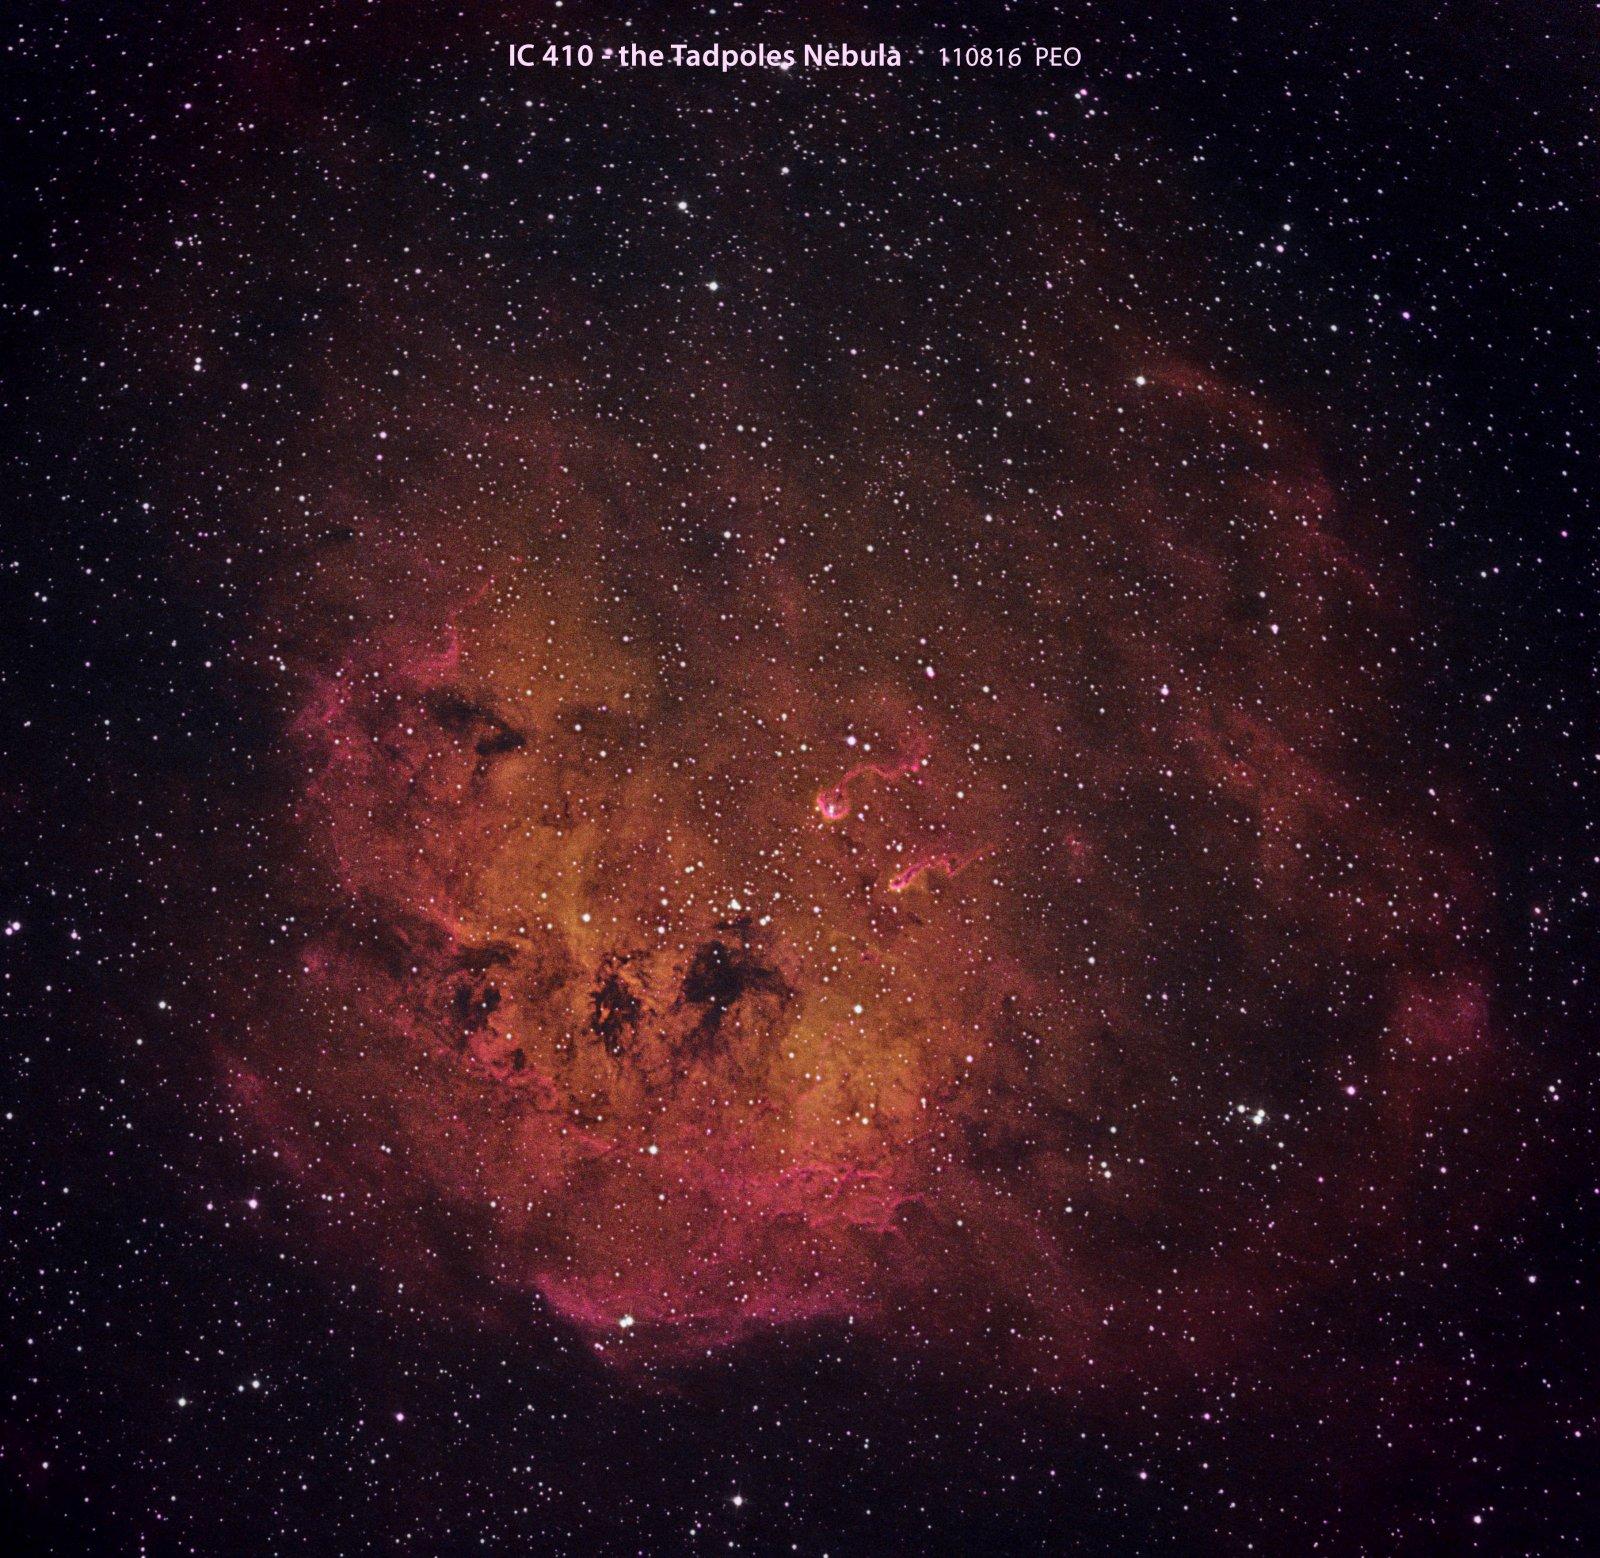 IC410, the Tadpoles Nebula